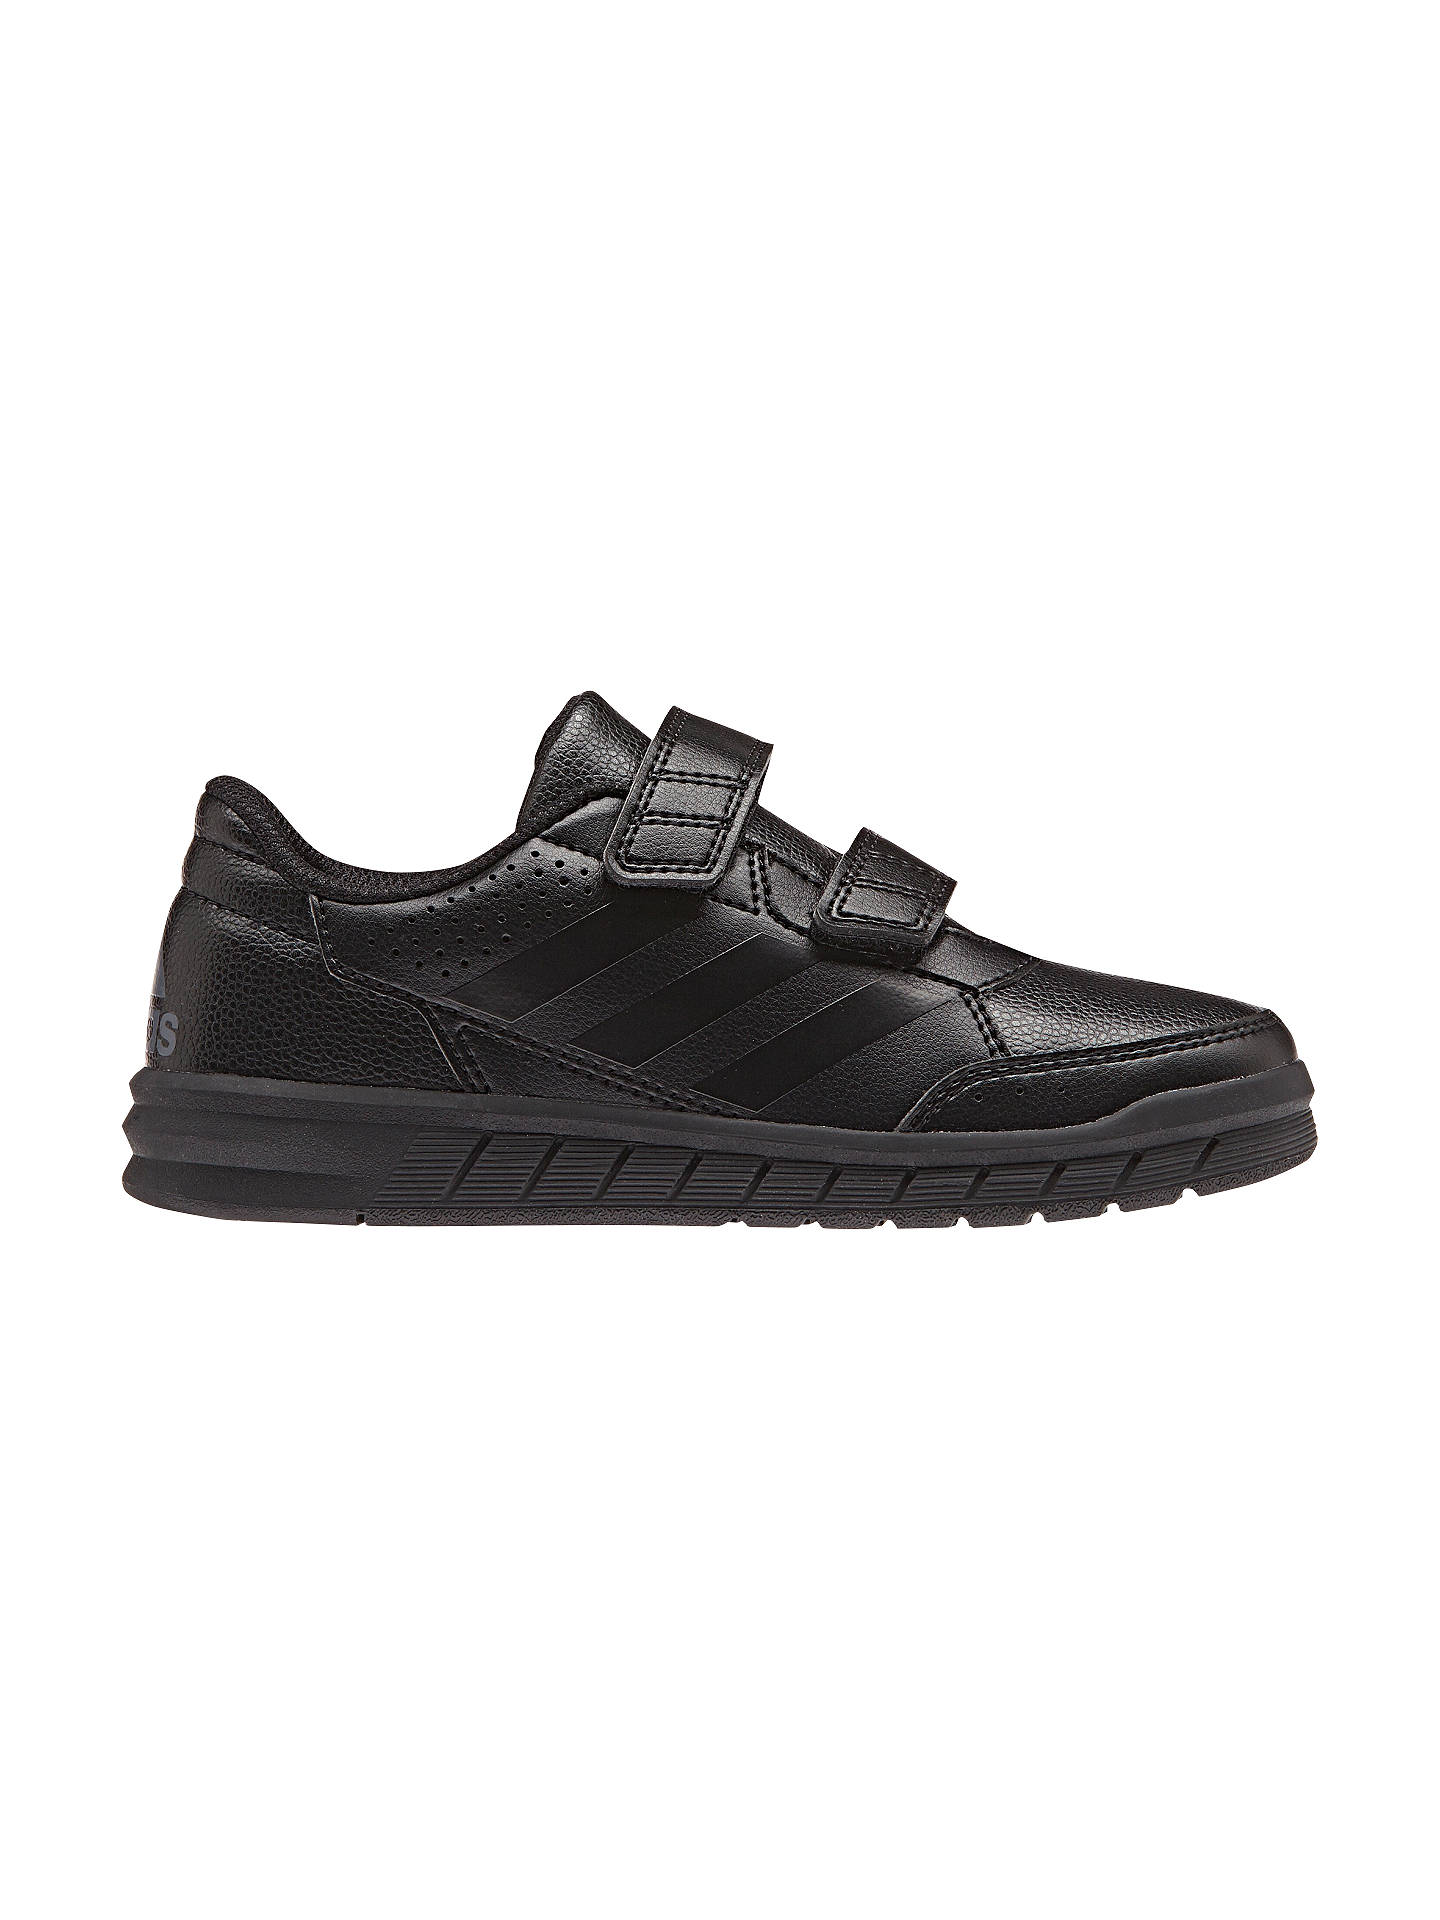 san francisco 1cffb 7760d Buy adidas Junior Alta Sport CF Riptape Trainers, Black, 11 Jnr Online at  johnlewis ...